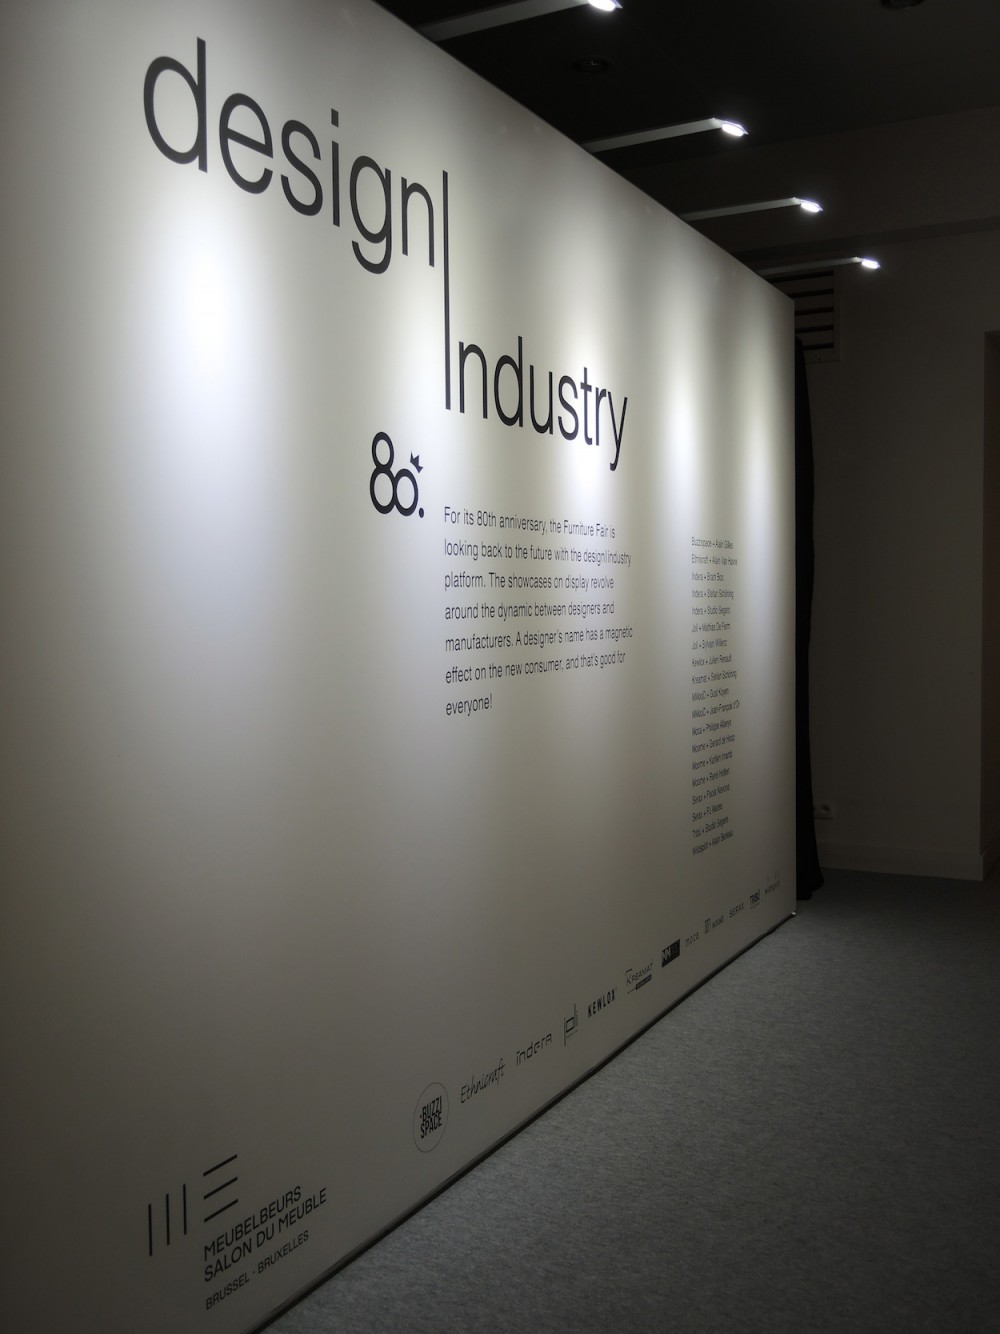 Showroom Meubels Design.2017 Designindustry Bxll